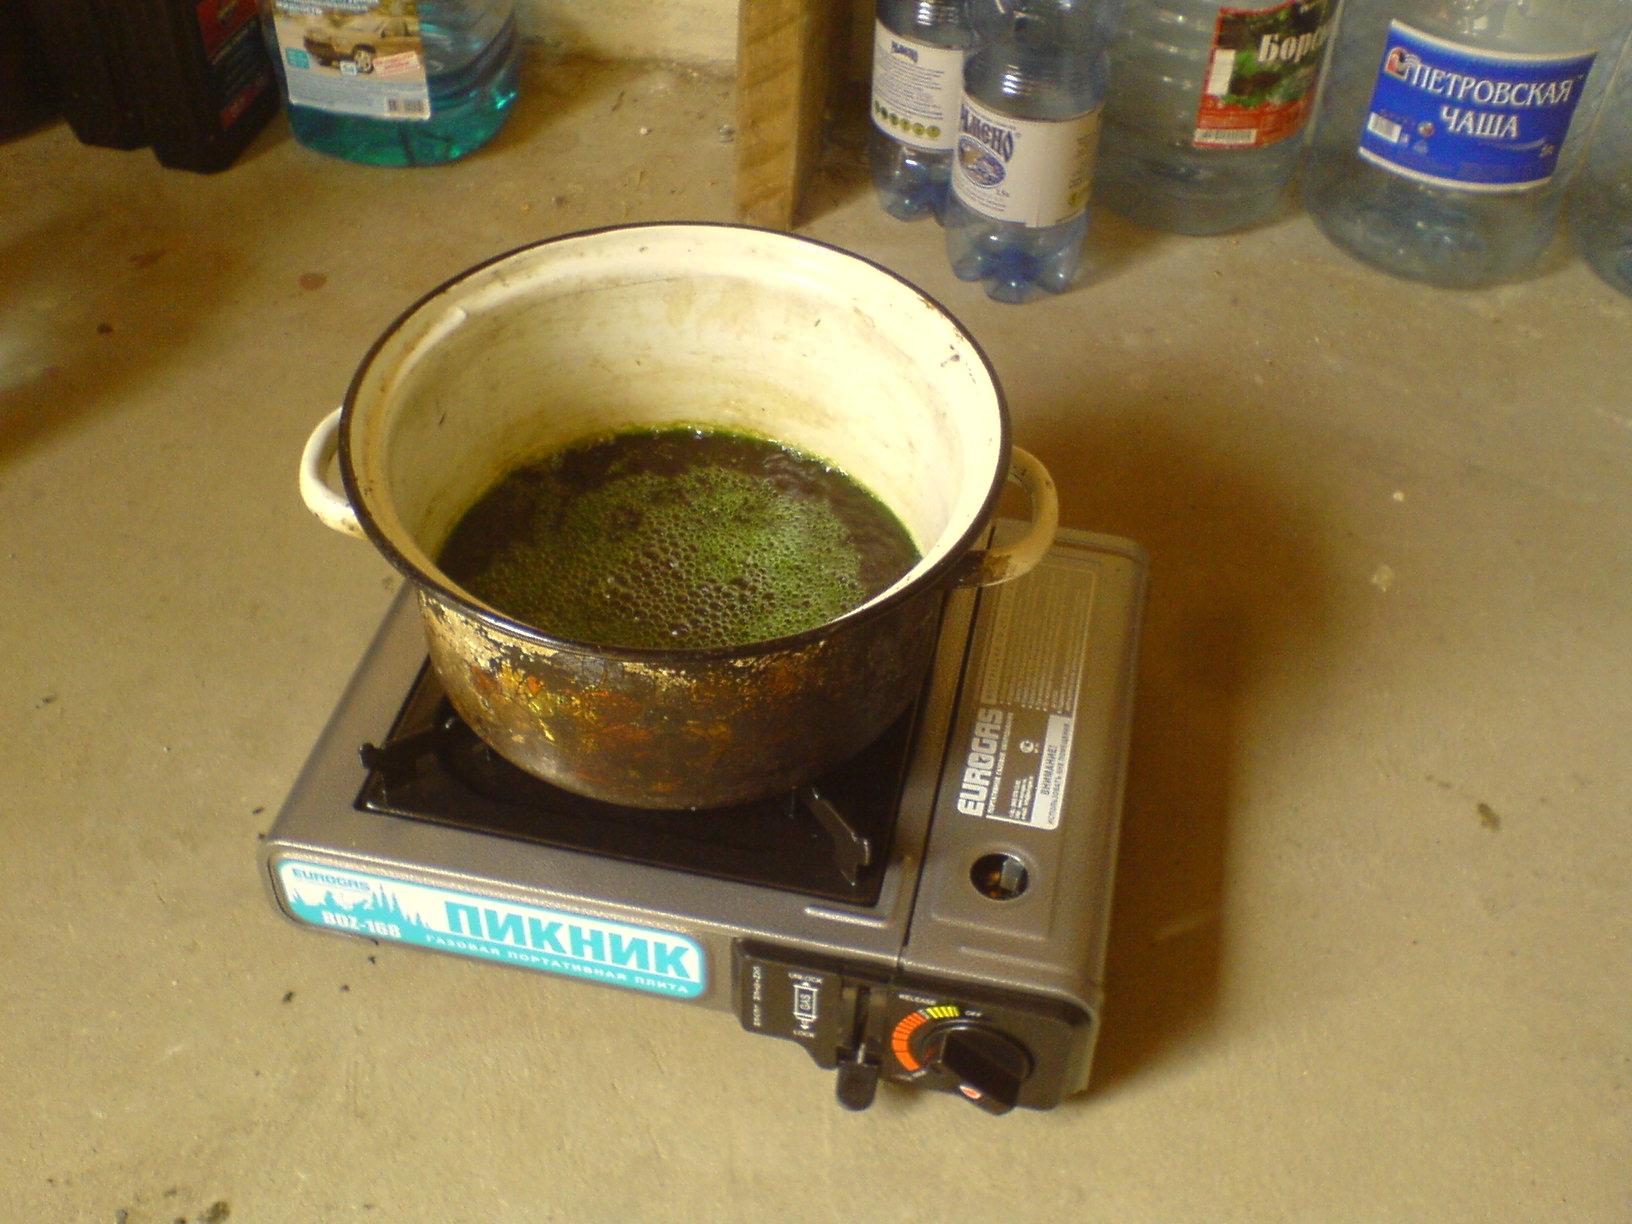 Варим химку с конопли марихуана росток